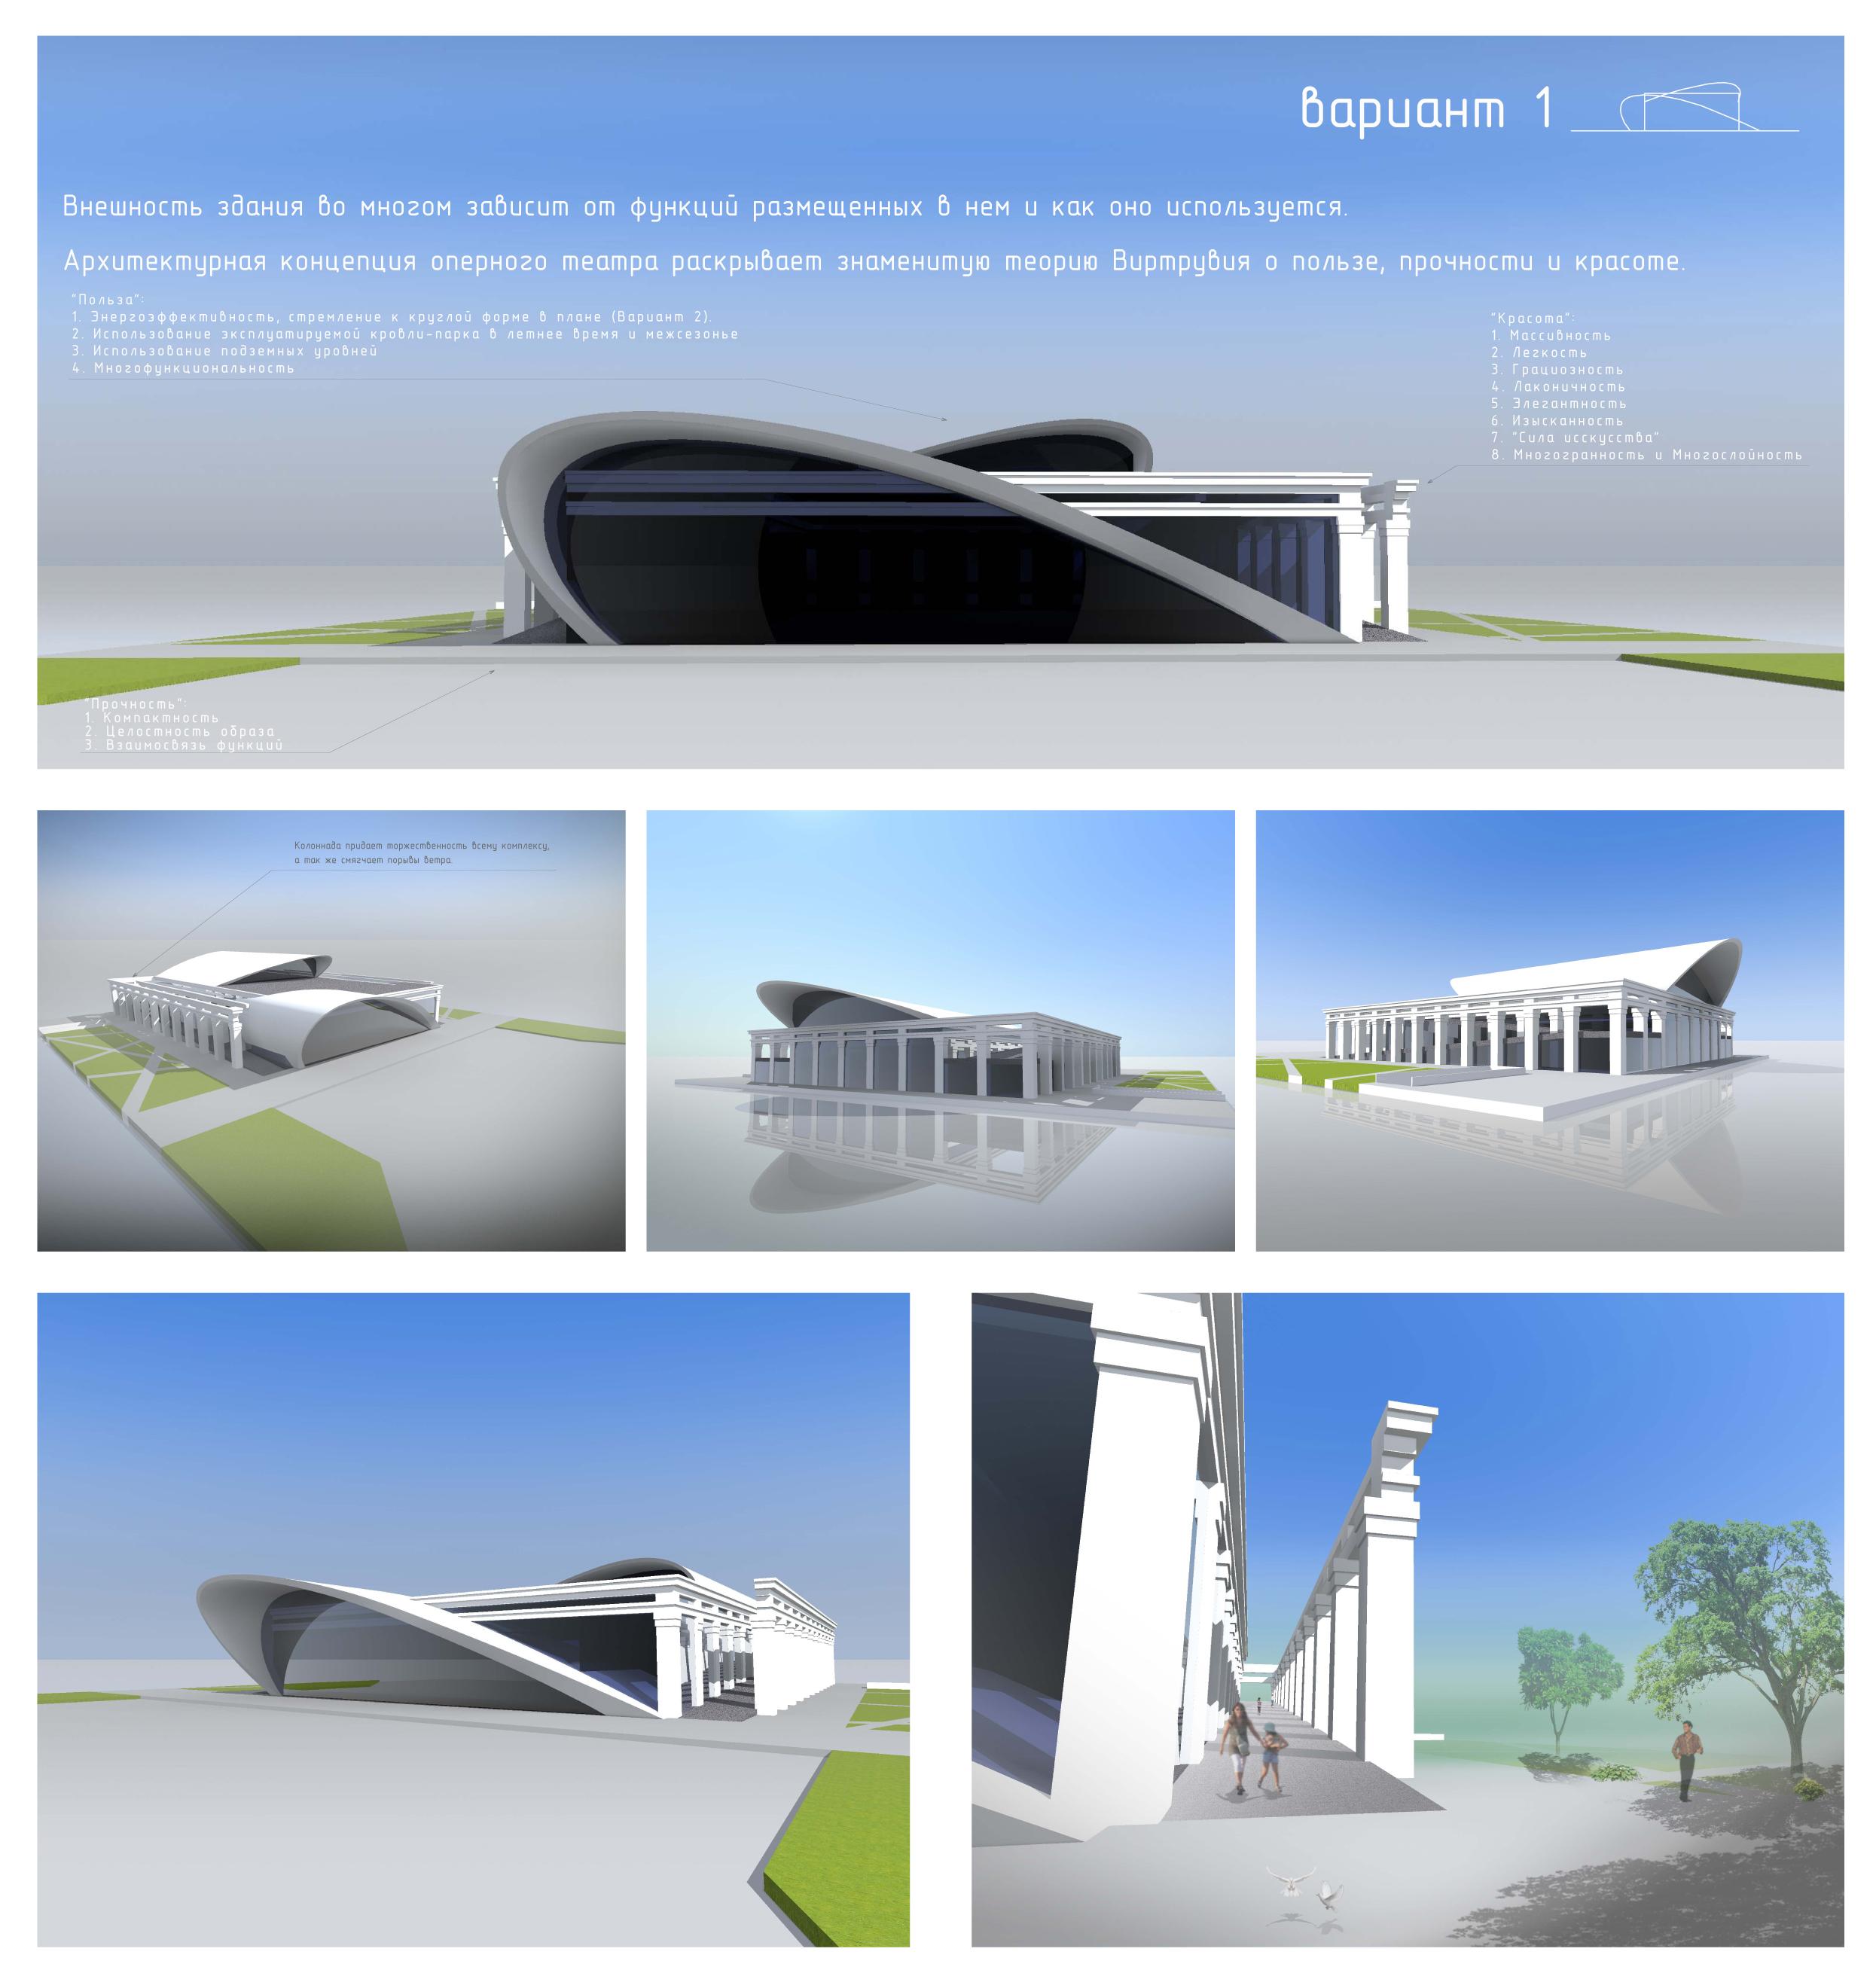 Разработка архитектурной концепции театра оперы и балета фото f_65752ede7251f1cc.jpg